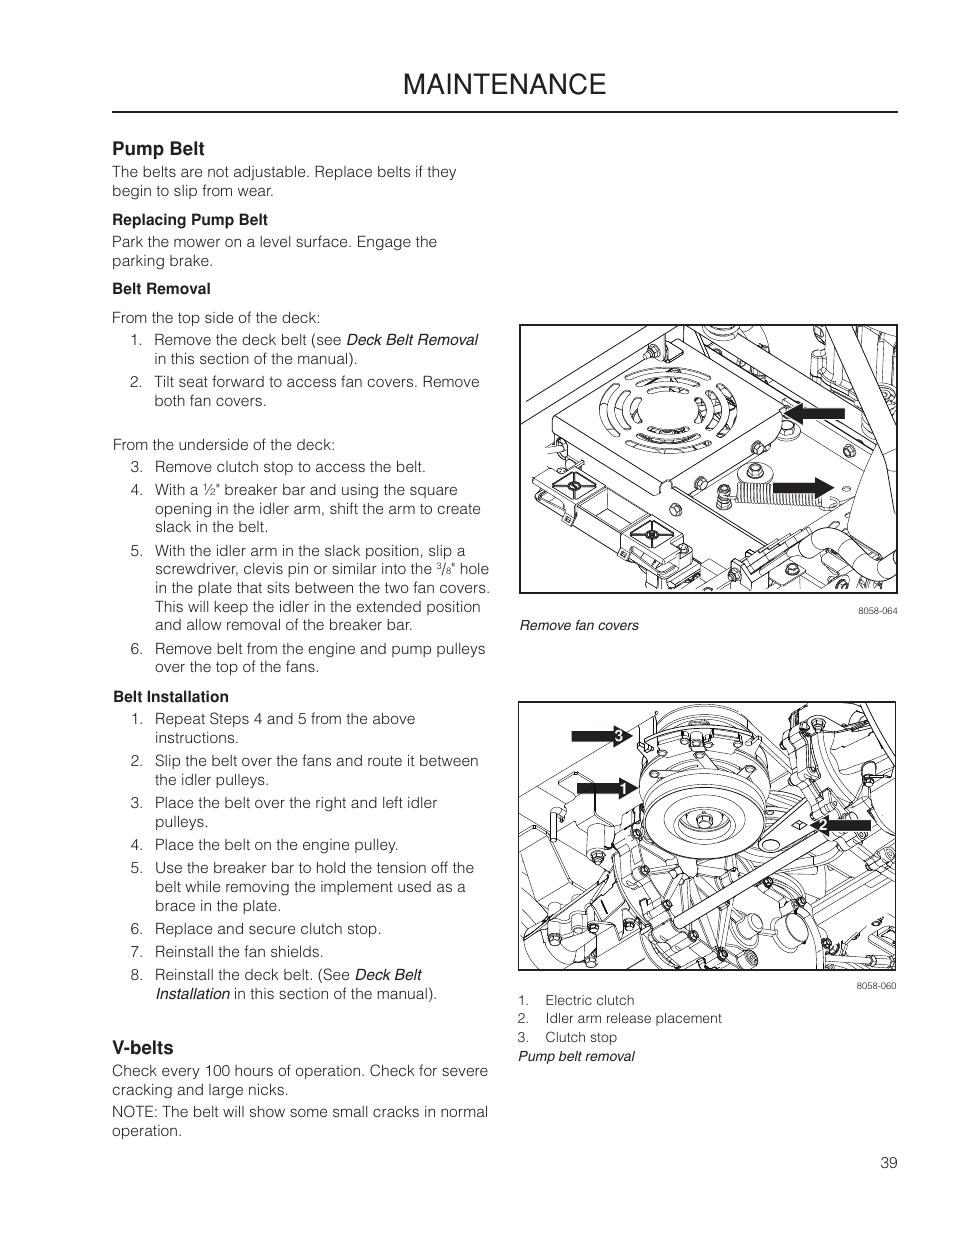 Pump belt, V-belts, Maintenance | Yazoo/Kees ZMKW 5222 User Manual | Page  39 / 64